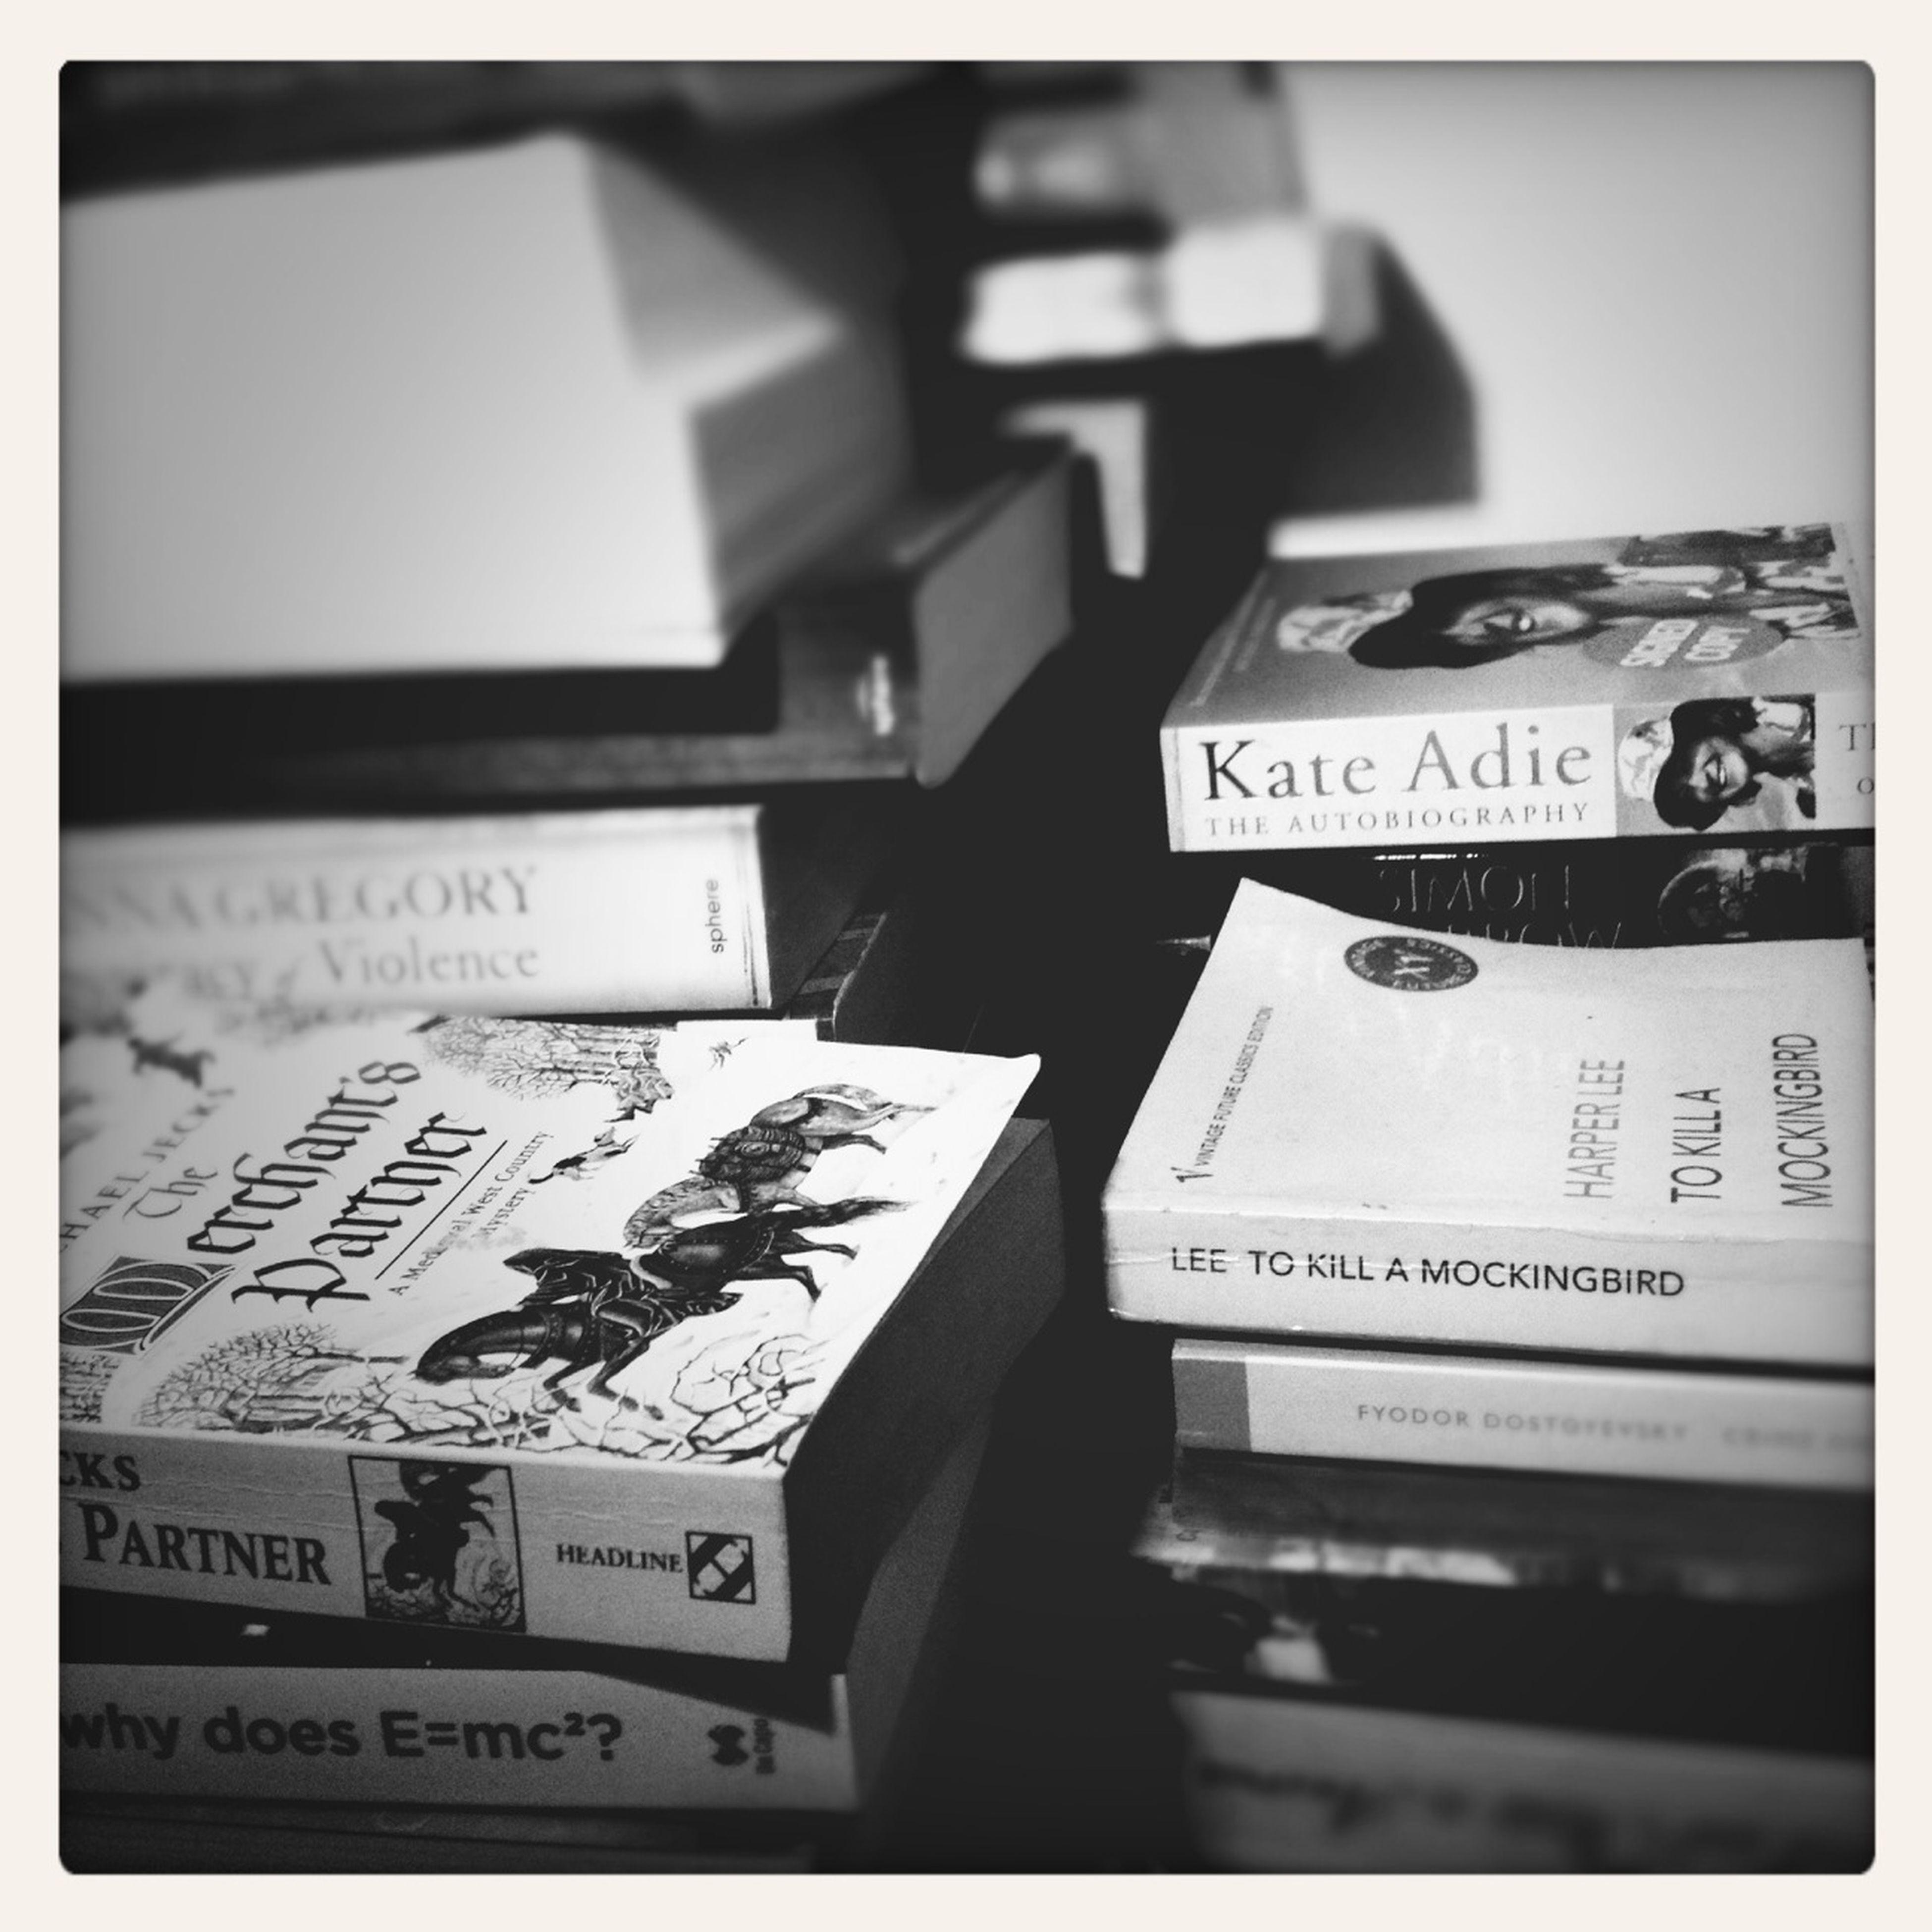 #mybookshelf (bedside table)